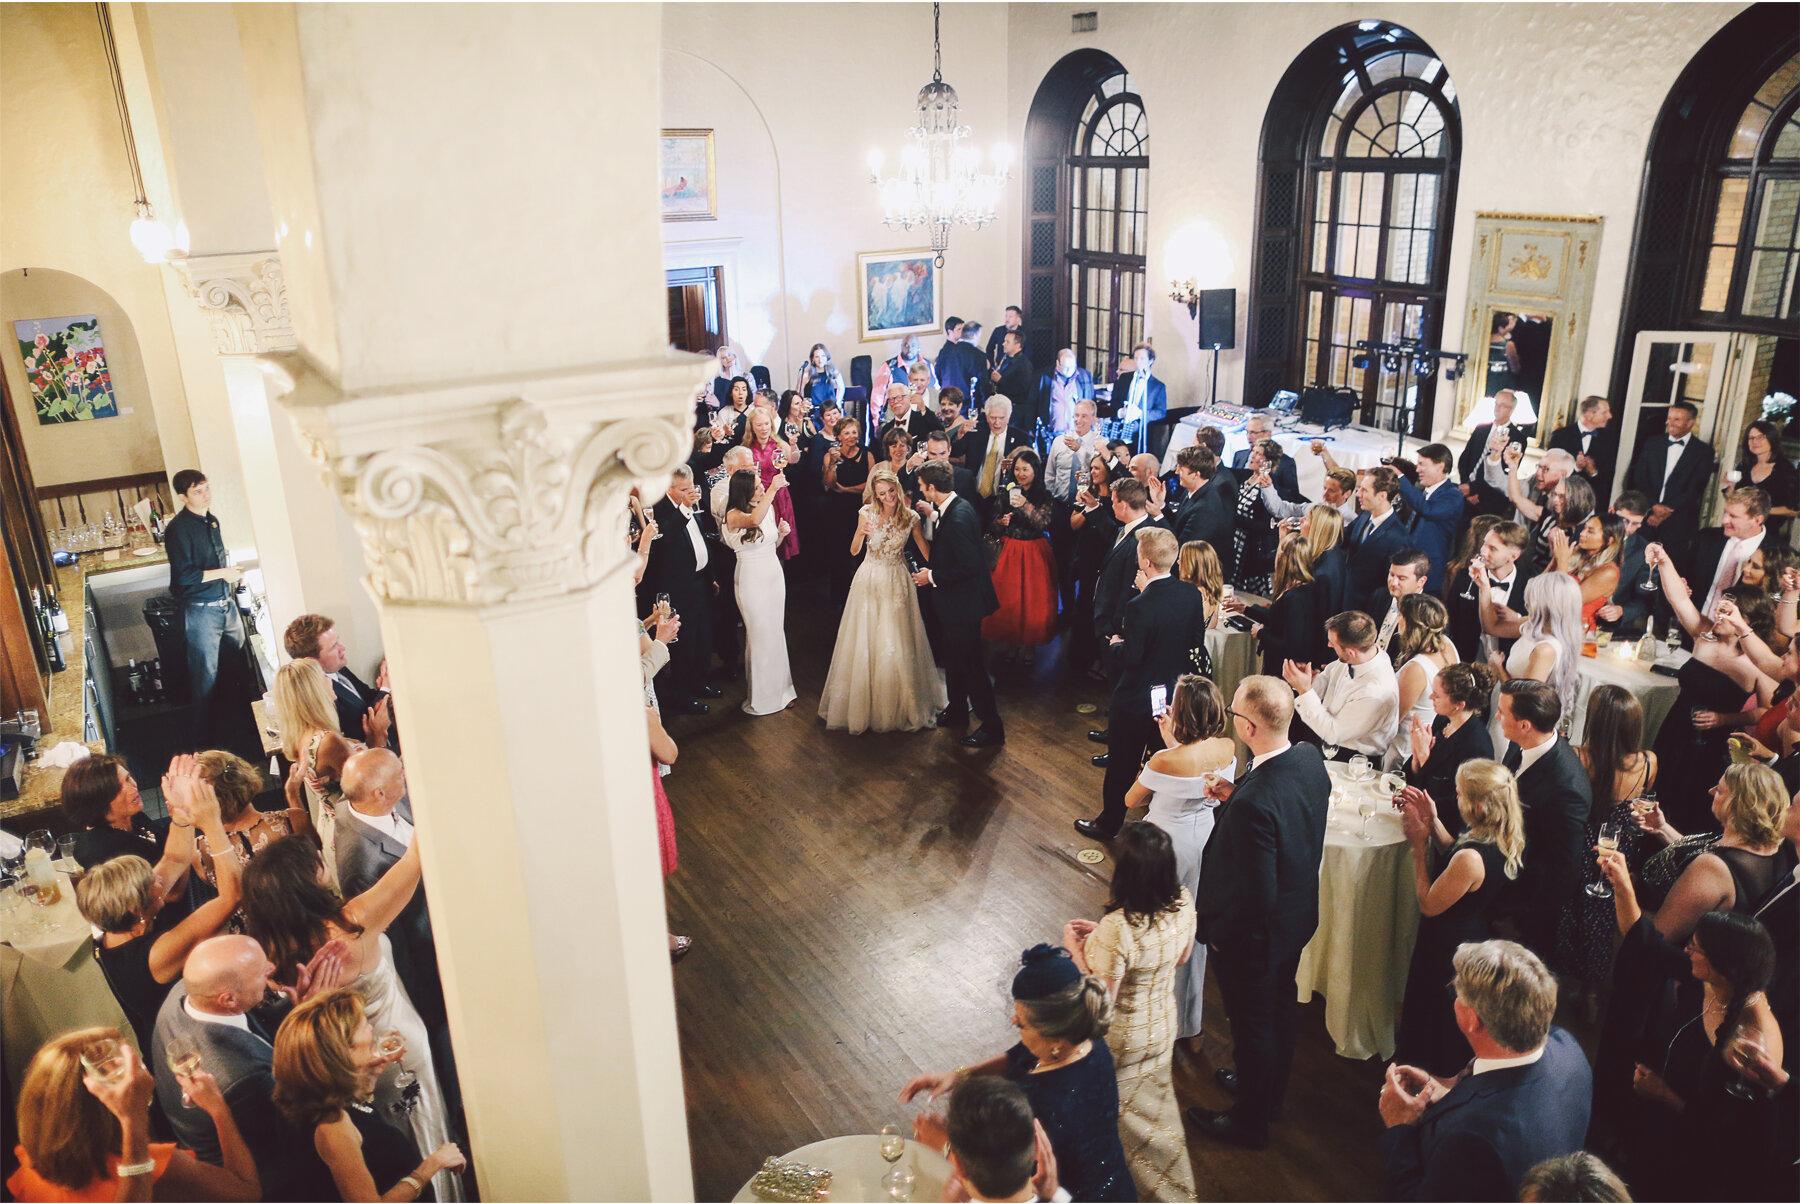 21 Wedding Vick Photography Minneapolis Minnesota Reception Womens Club Toast Crowd Michelle and William.jpg